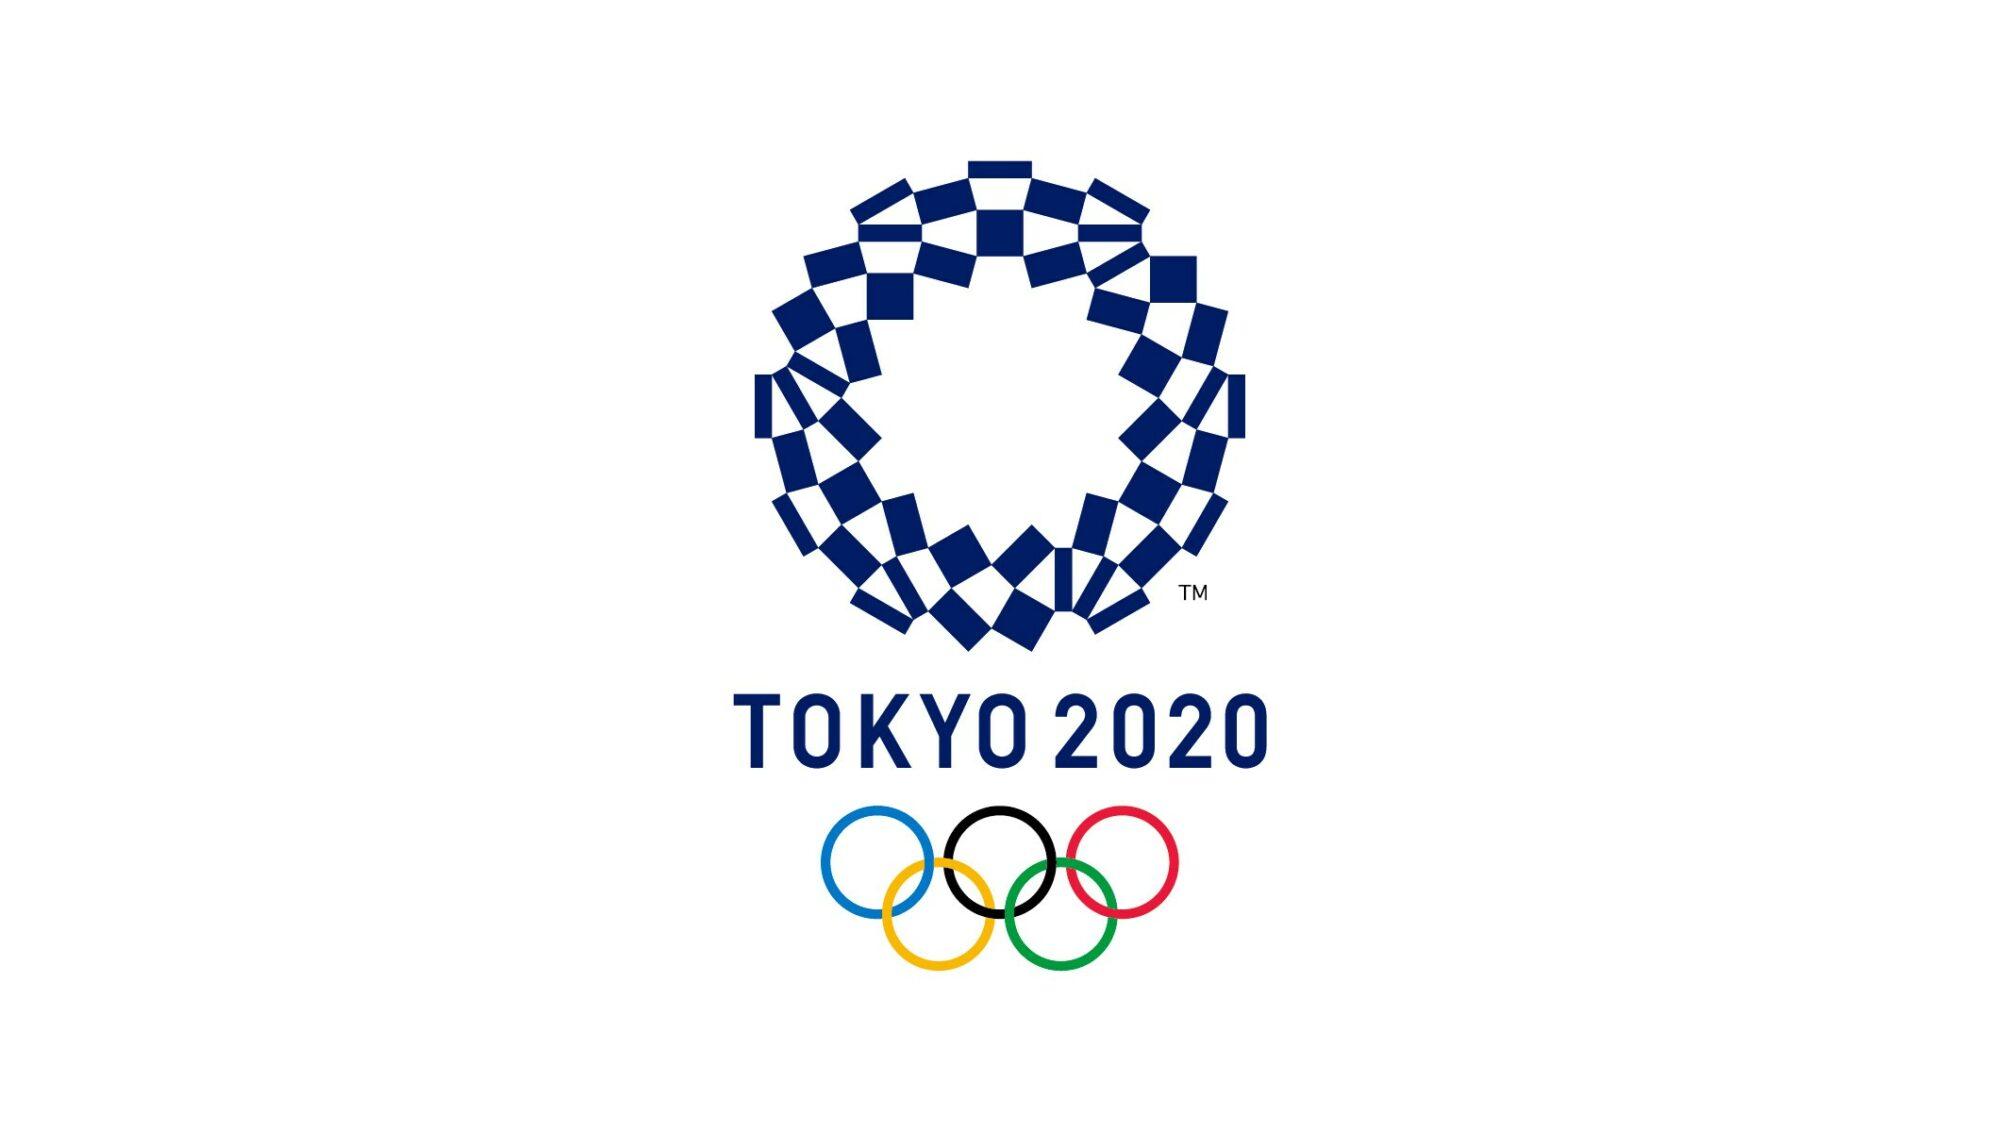 calendrier-epreuves-jeux-olympiques-jo-tokyo-2020